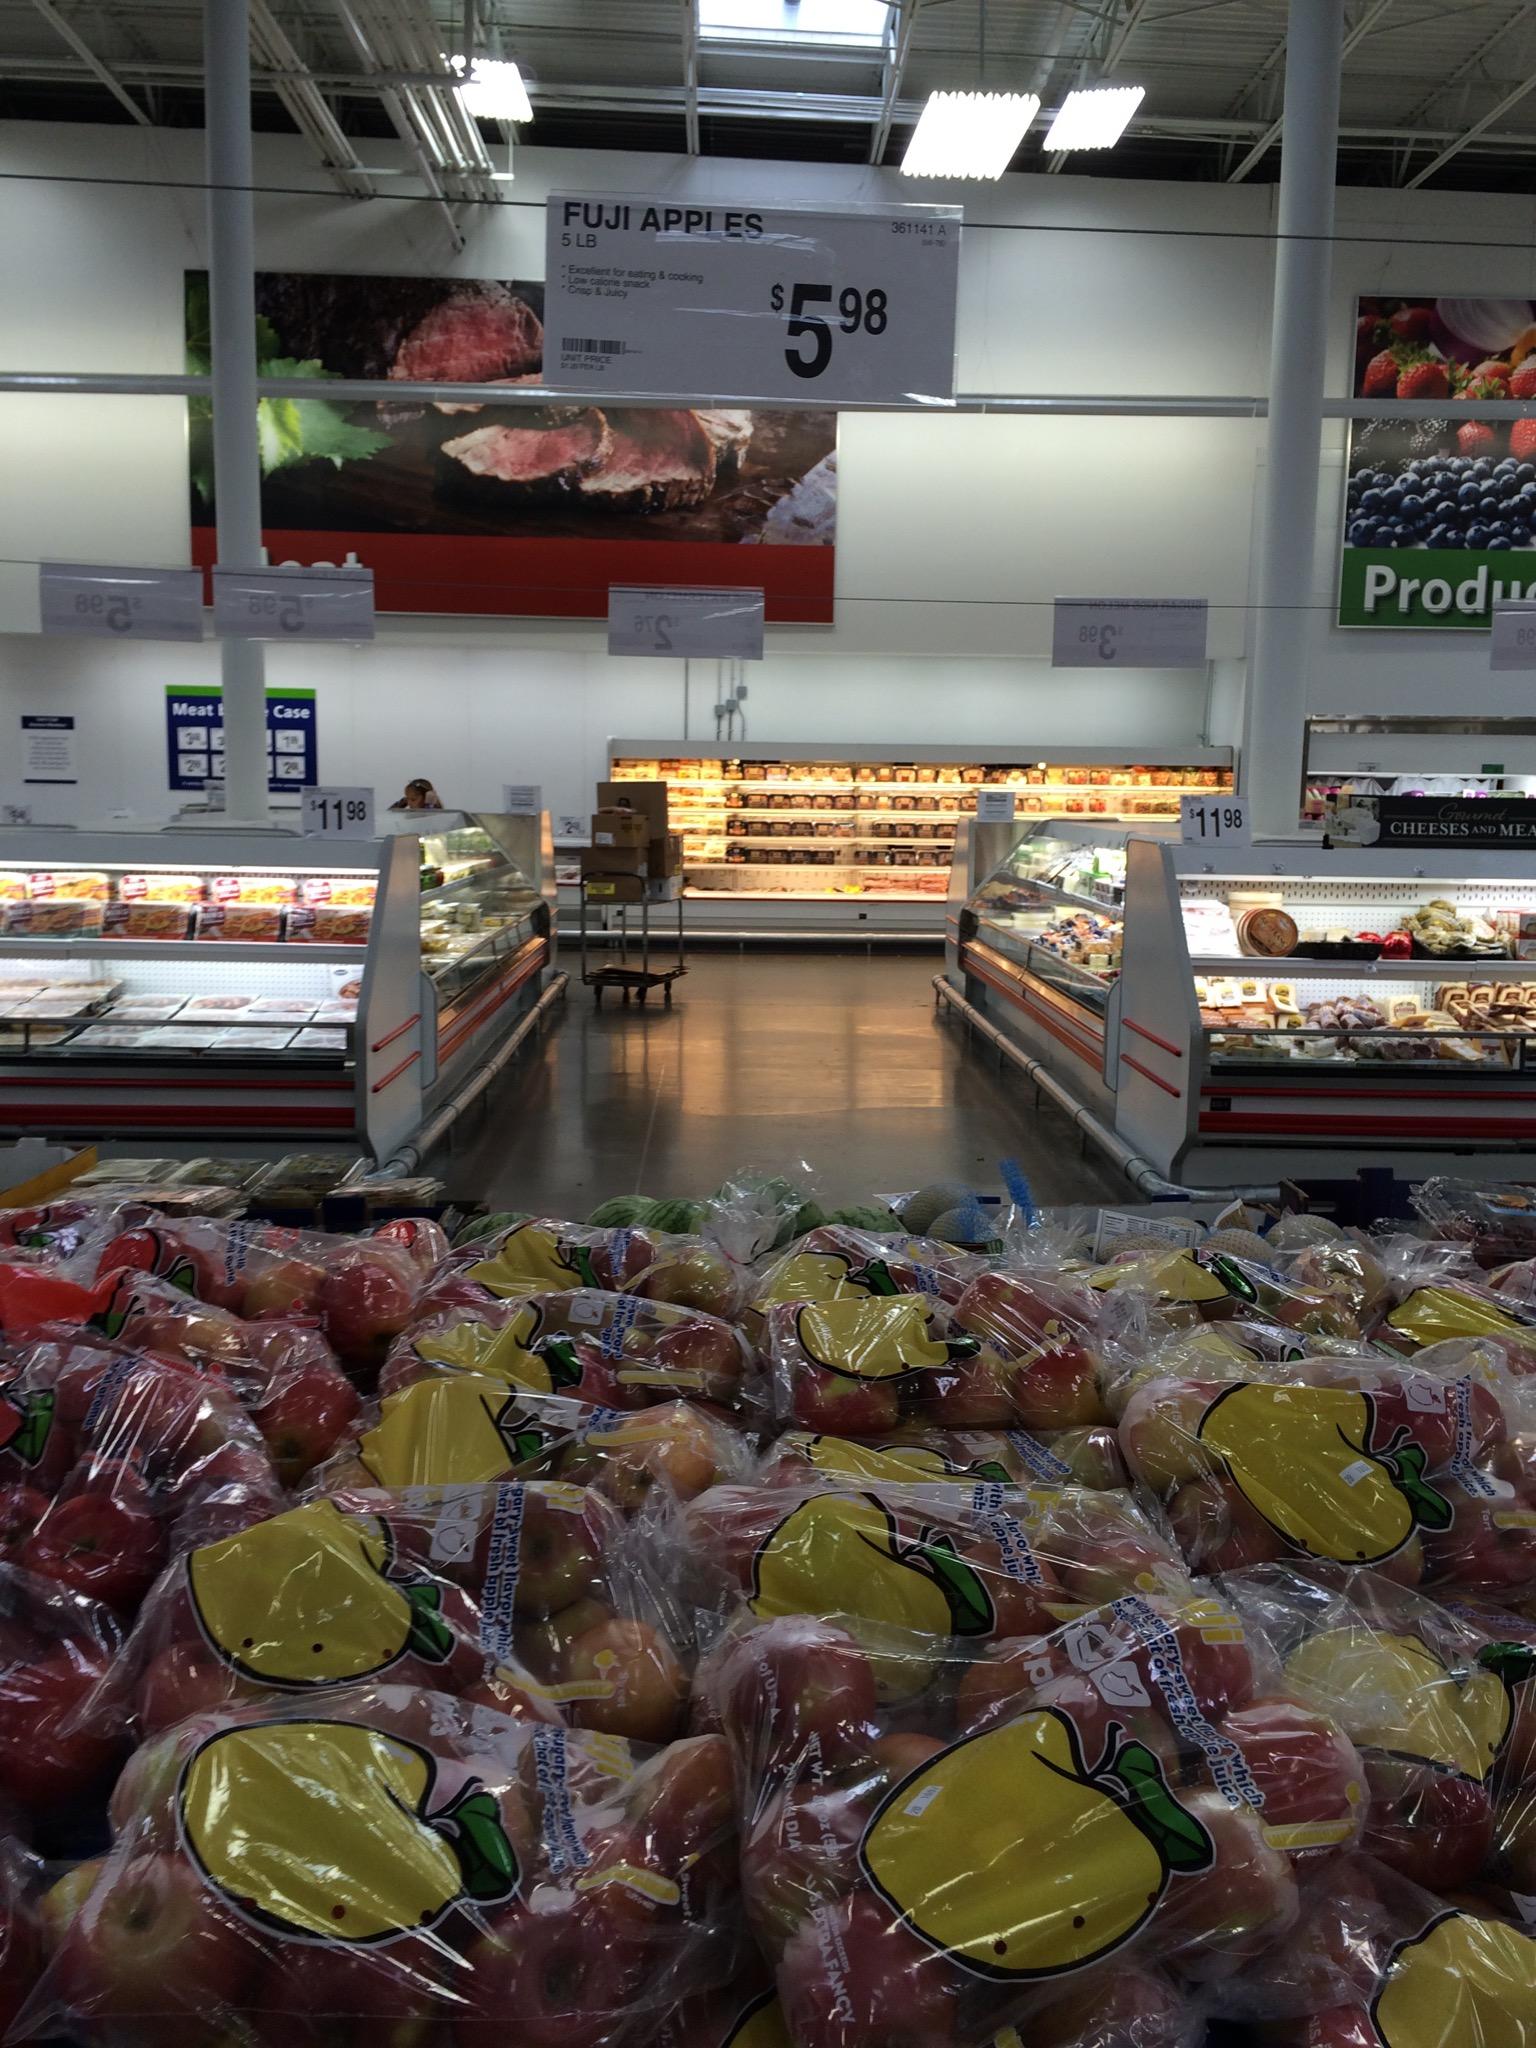 Sams Club Vs Costco Prices Snack Food Prices